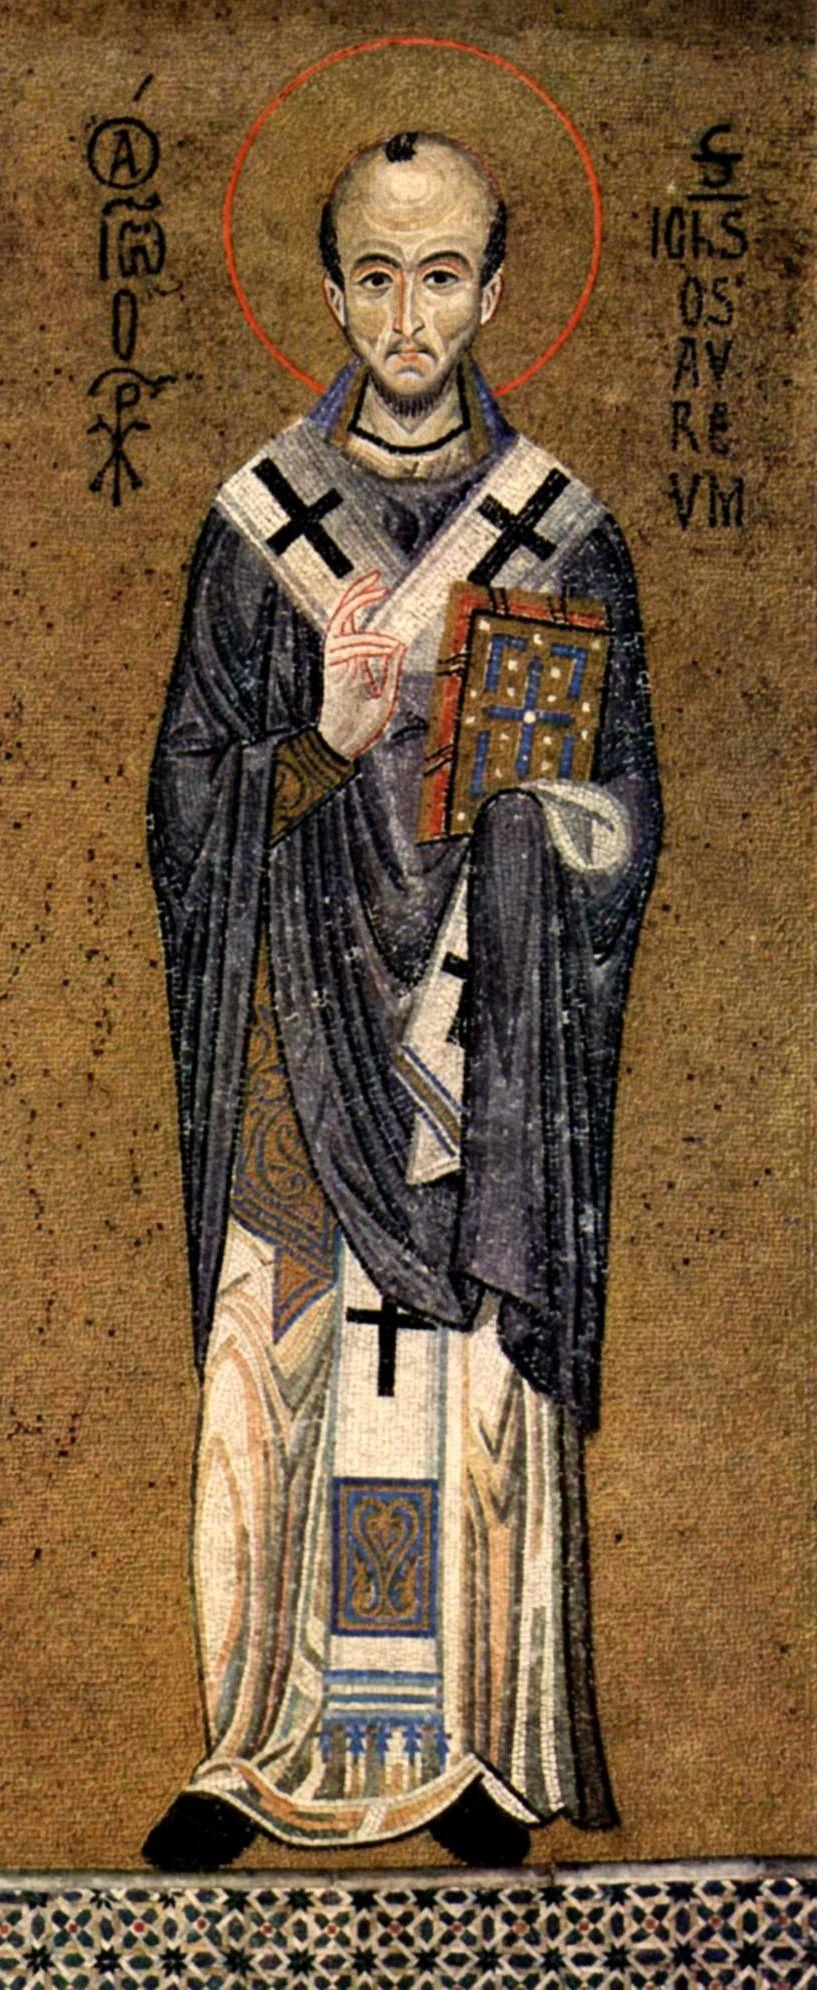 Face and hair. Saint John Chrysostom, c. 1150 mosaic in the Palatine Chapel, Palermo.